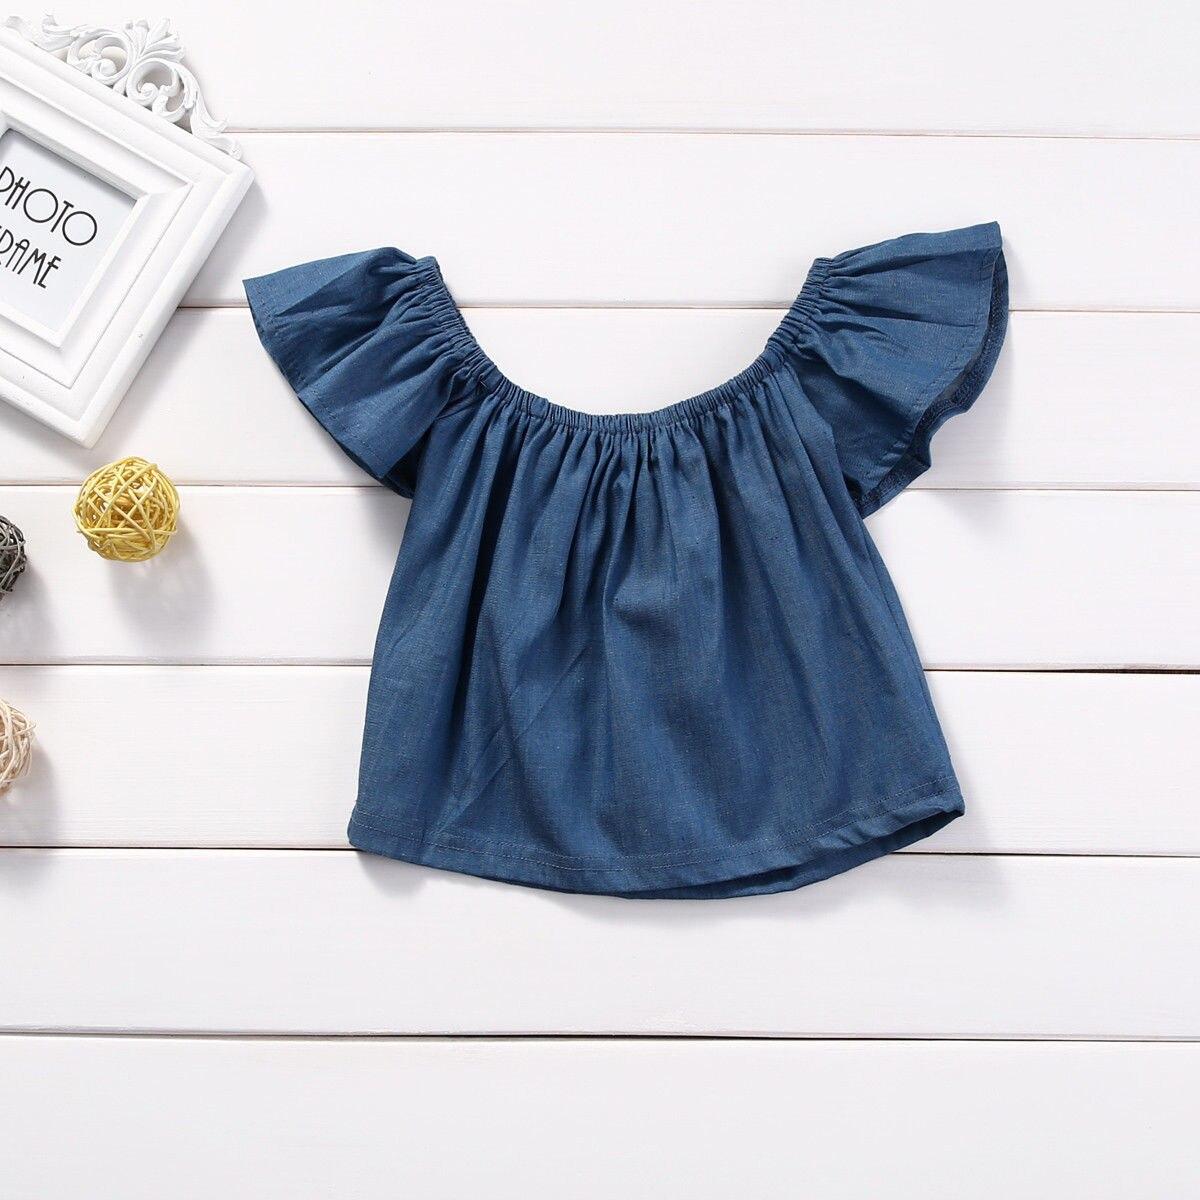 Children T-Shirt Tops Short-Sleeve Toddler Girls Infant Baby Casual Summer Fashion Kid